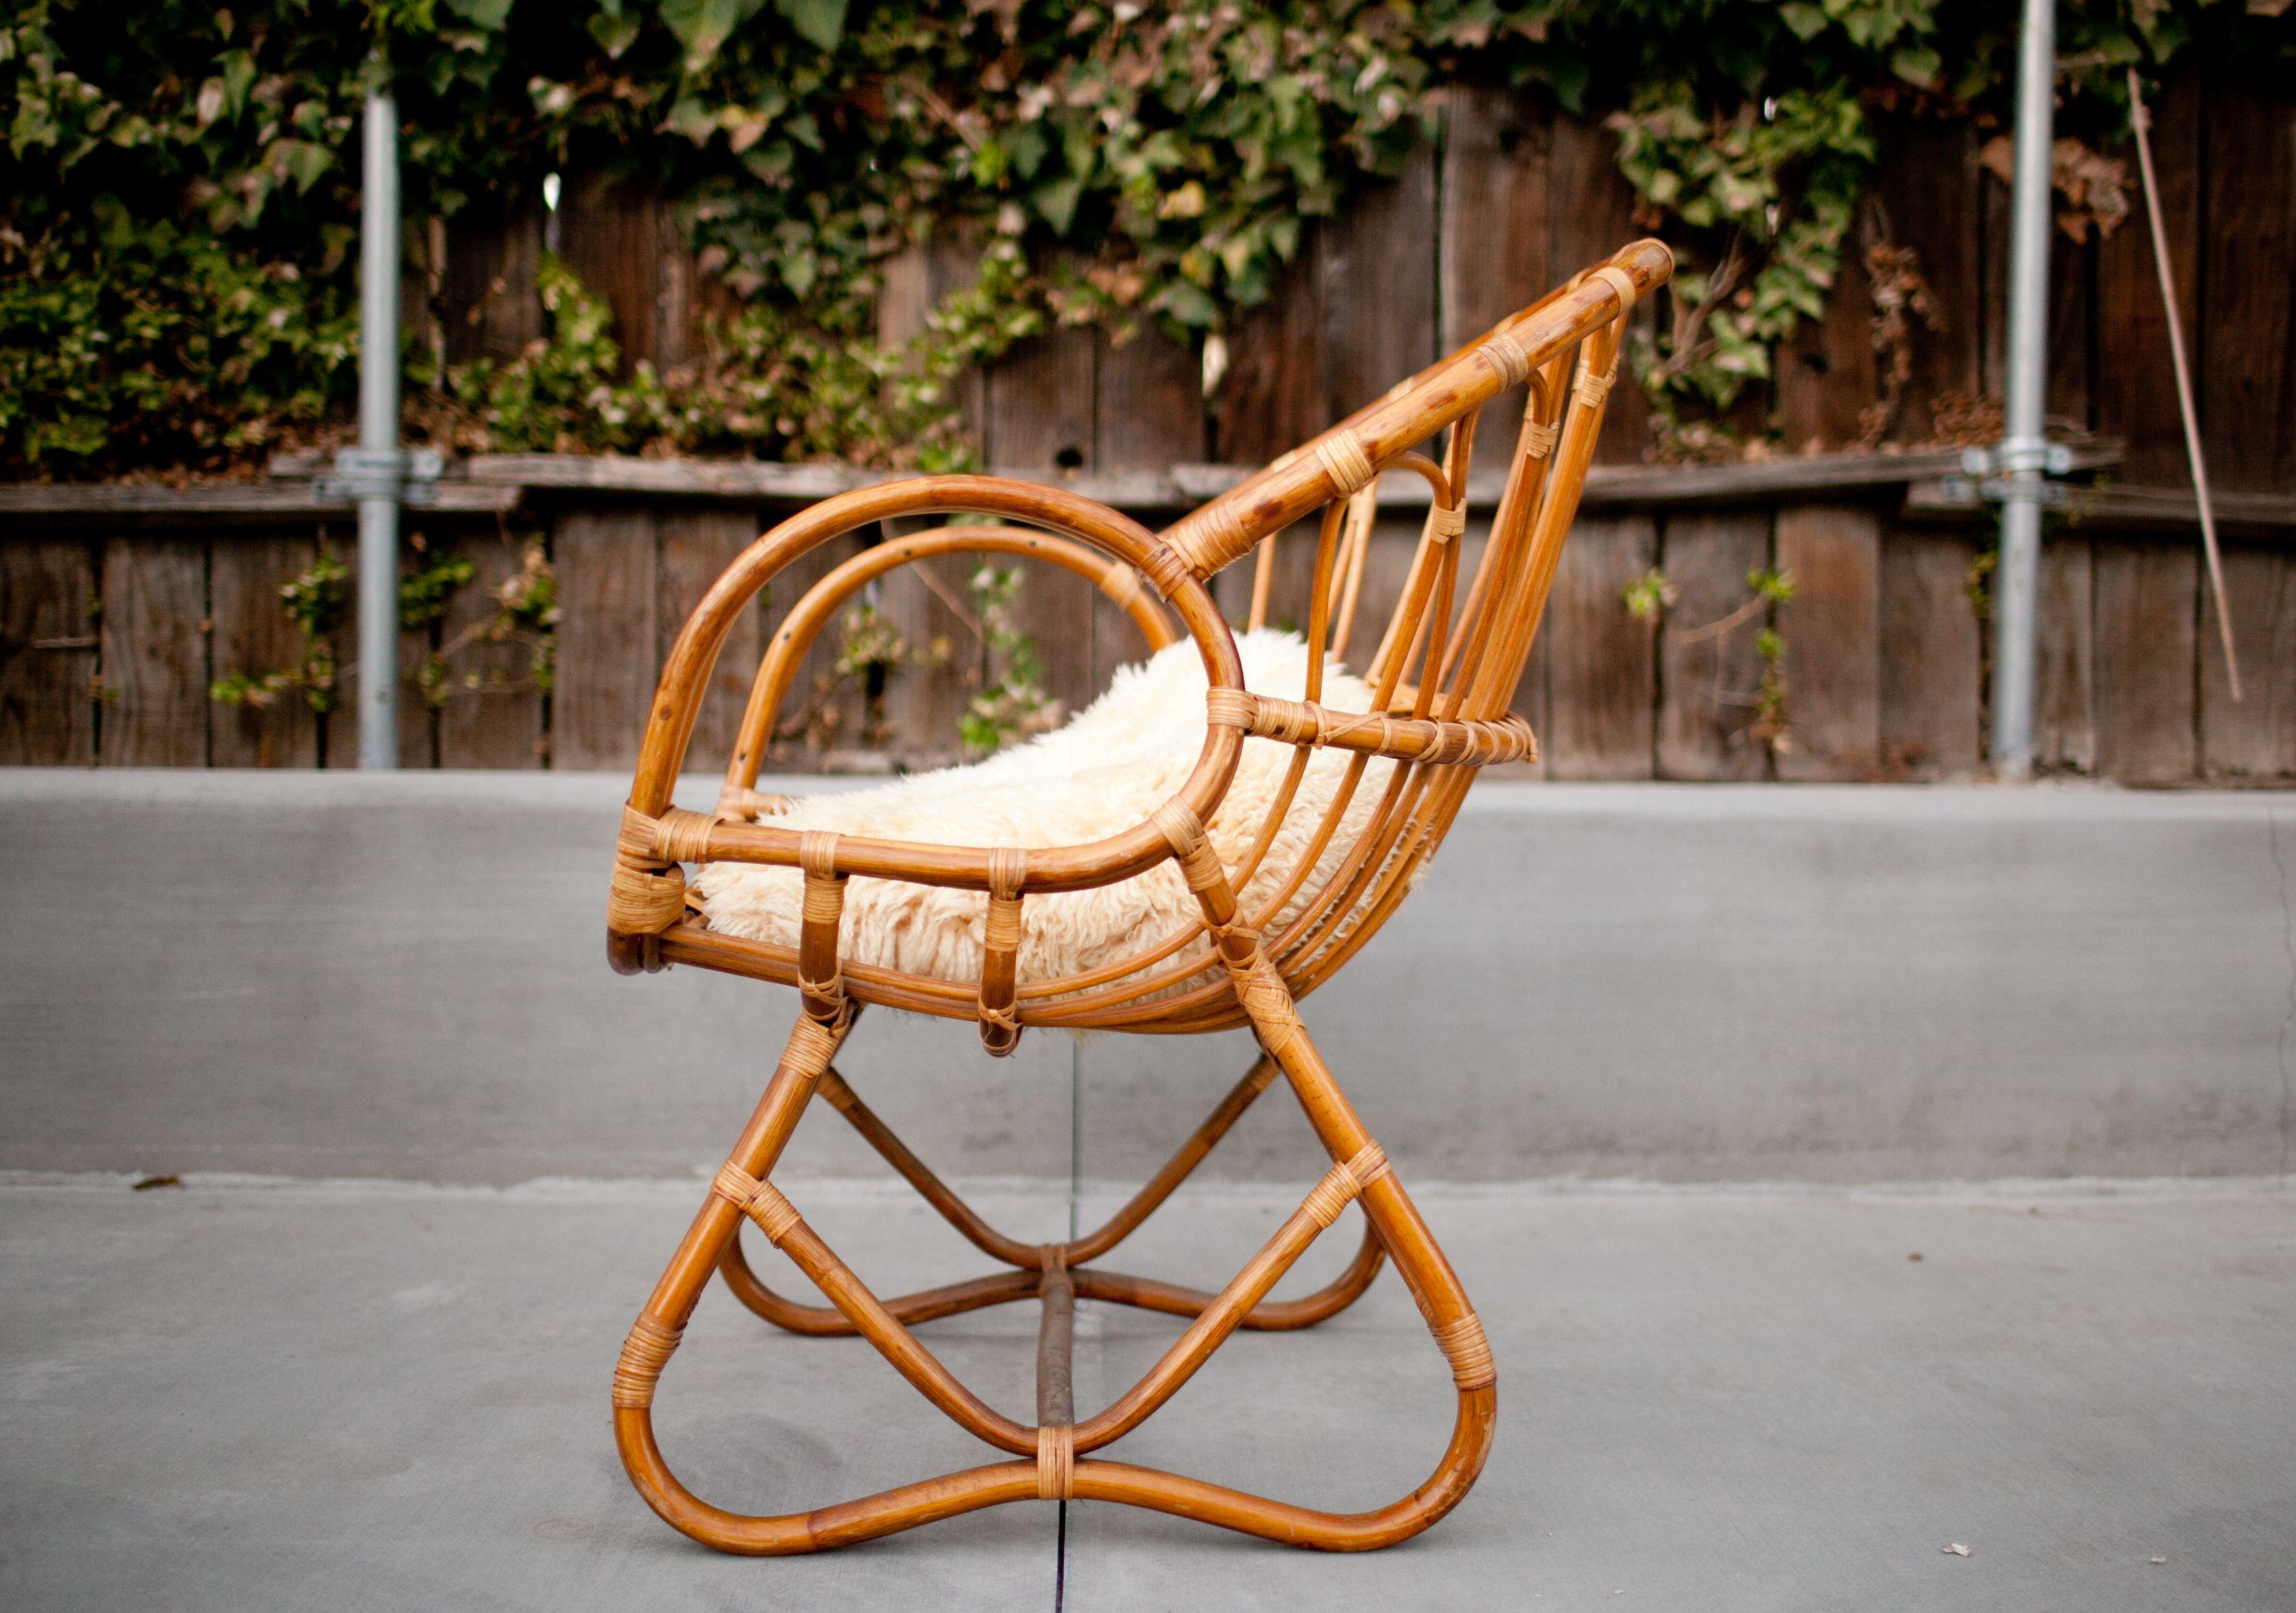 bamboo rattan chairs. 1960\u0027s Rohe Noordwolde Cane Chair - Bamboo Rattan Arm Chairs